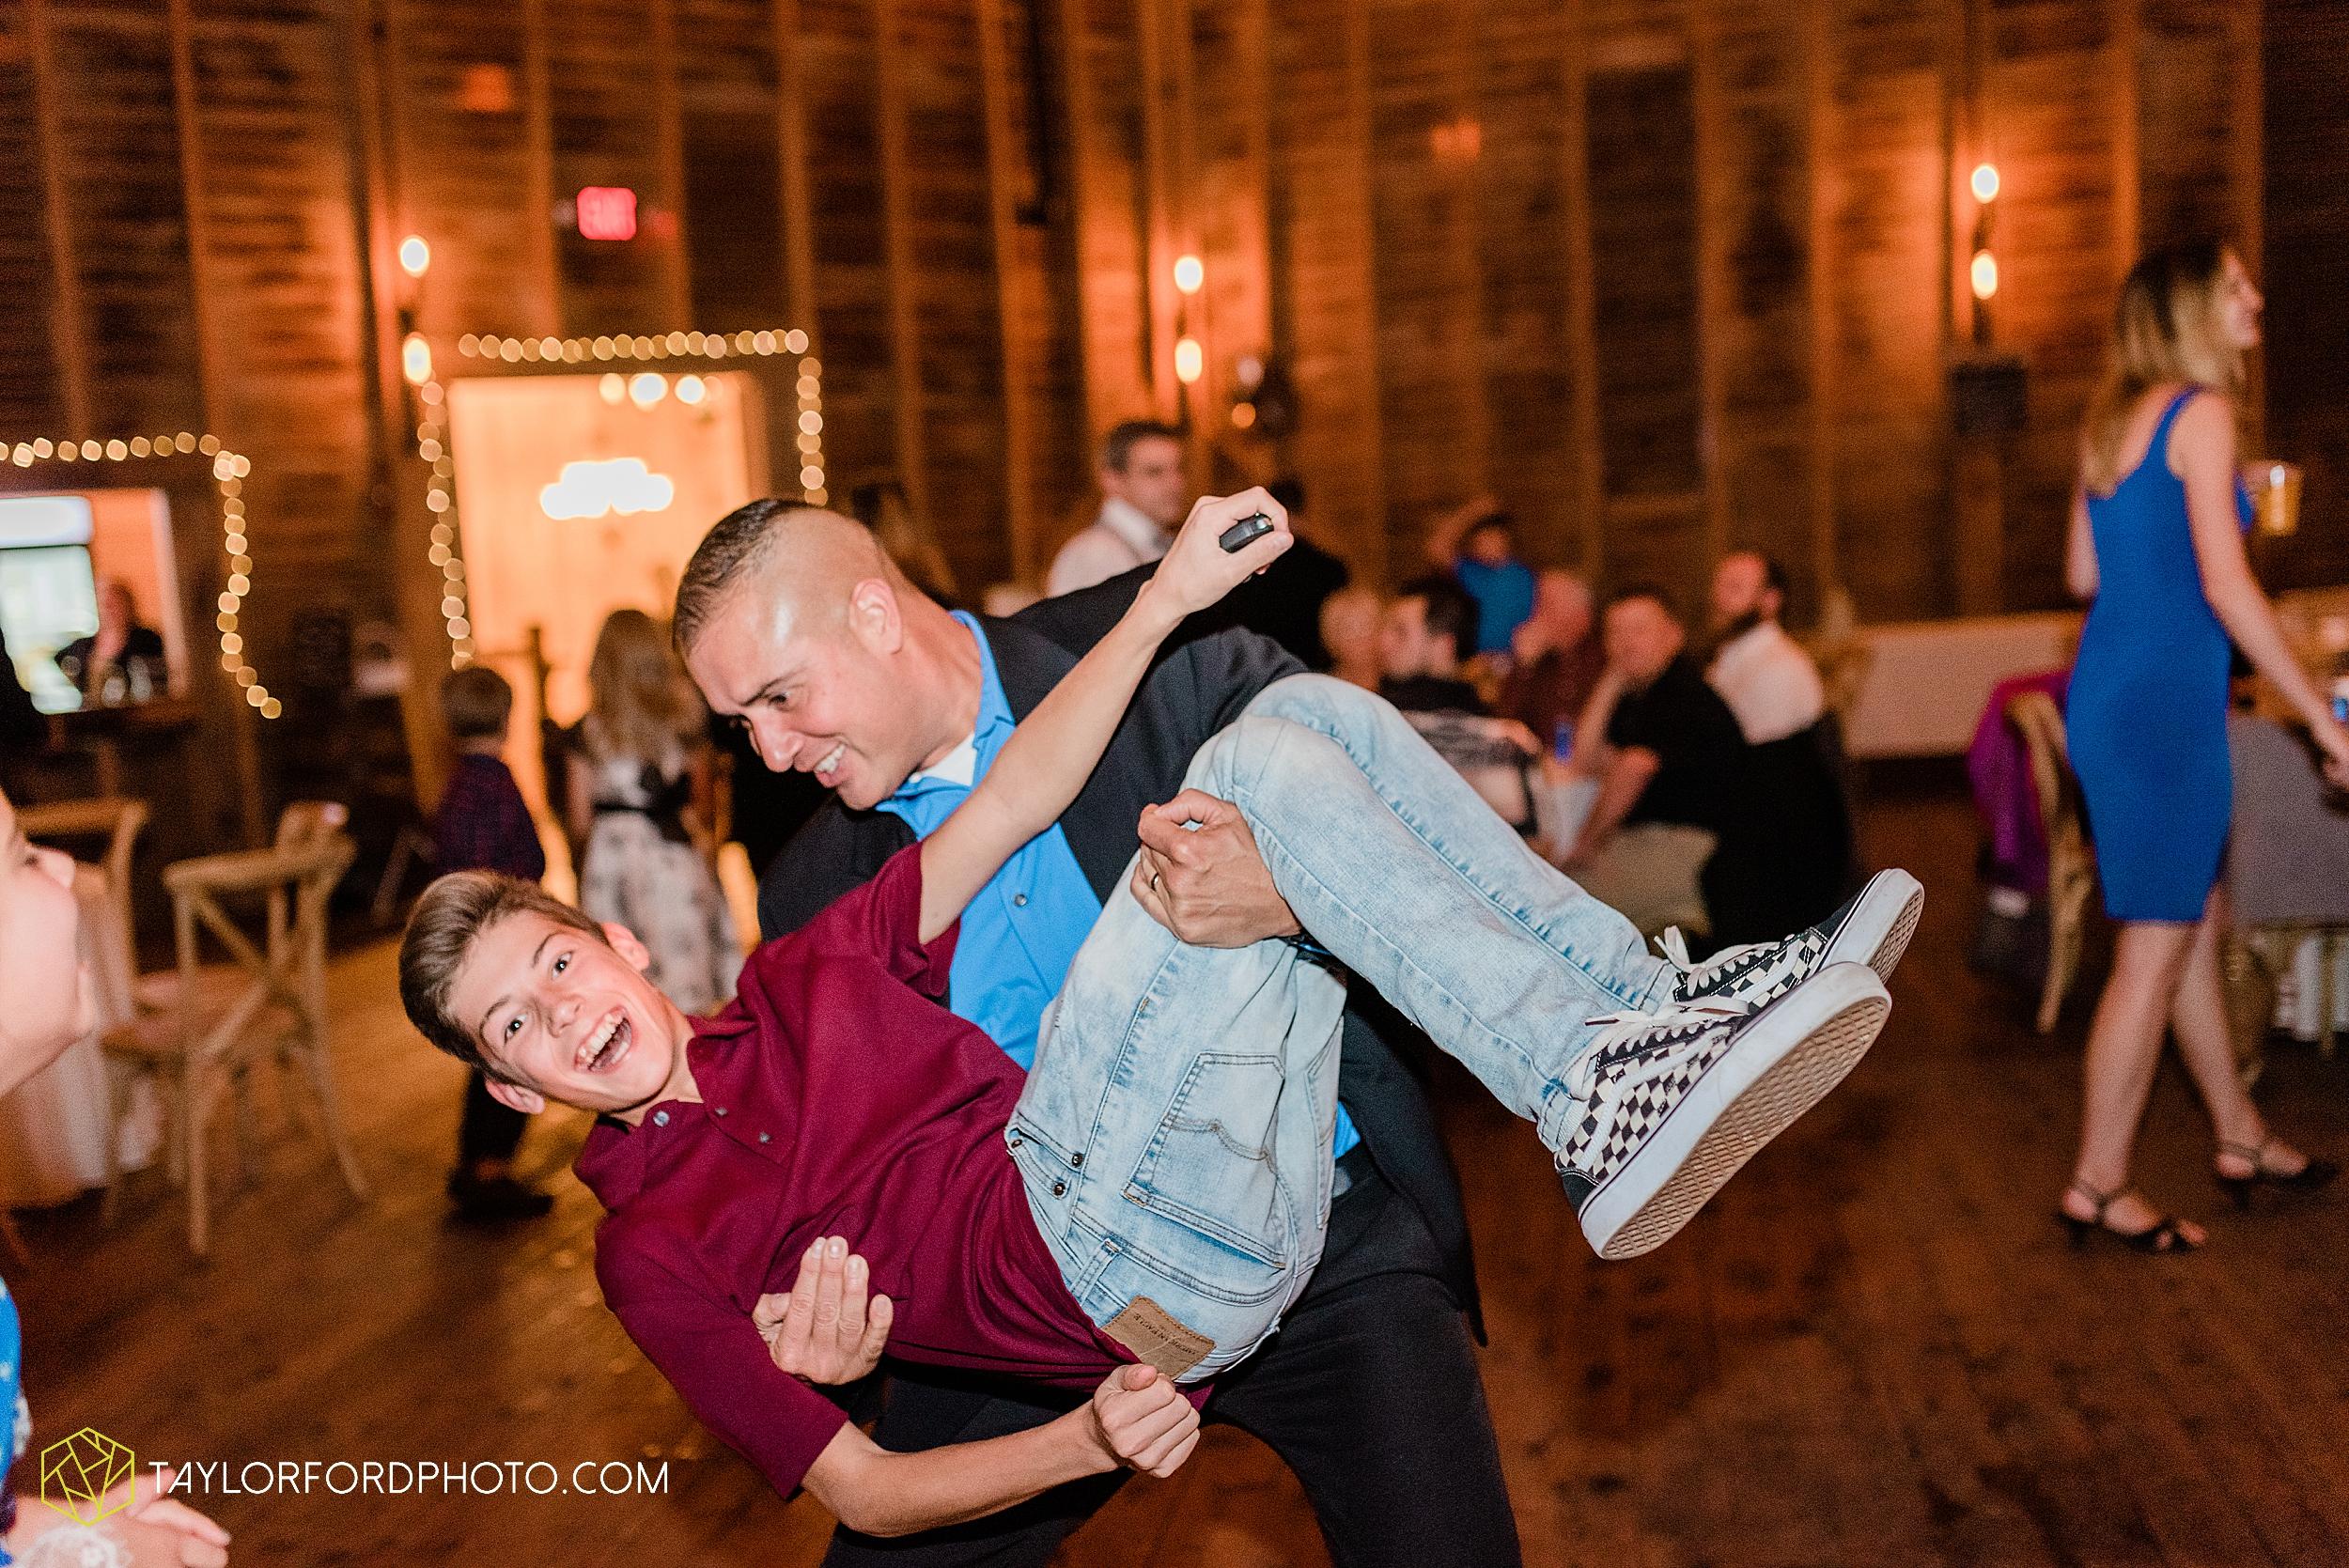 marissa-nicole-nick-daeger-orrmont-estate-farm-wedding-piqua-dayton-troy-ohio-fall-photographer-taylor-ford-photography_1563.jpg